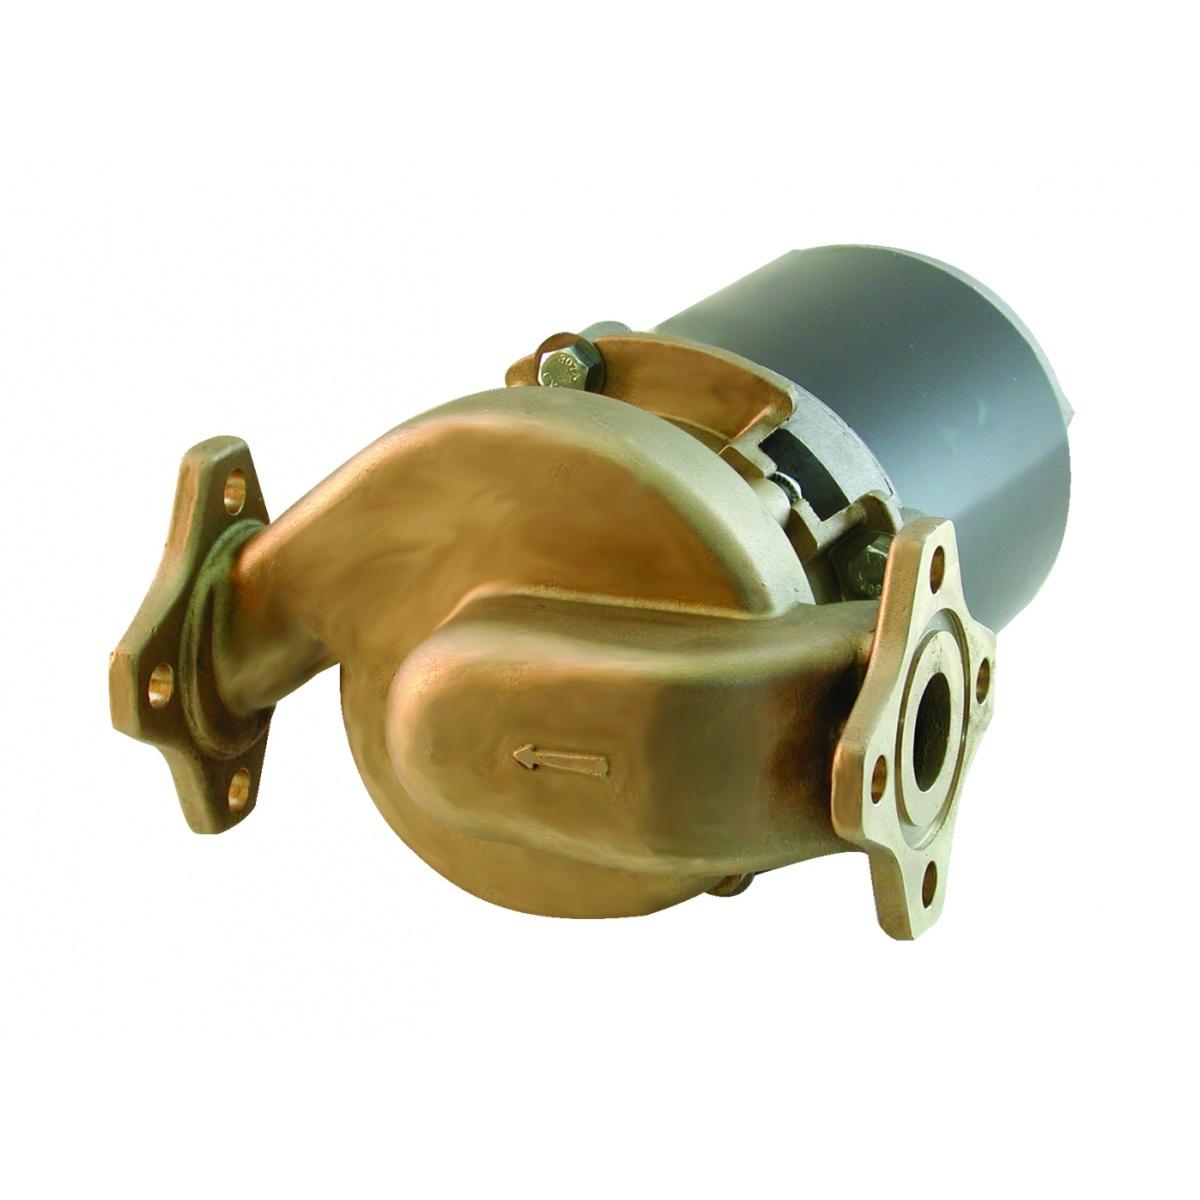 AMT Inline Centrifugal Pumps